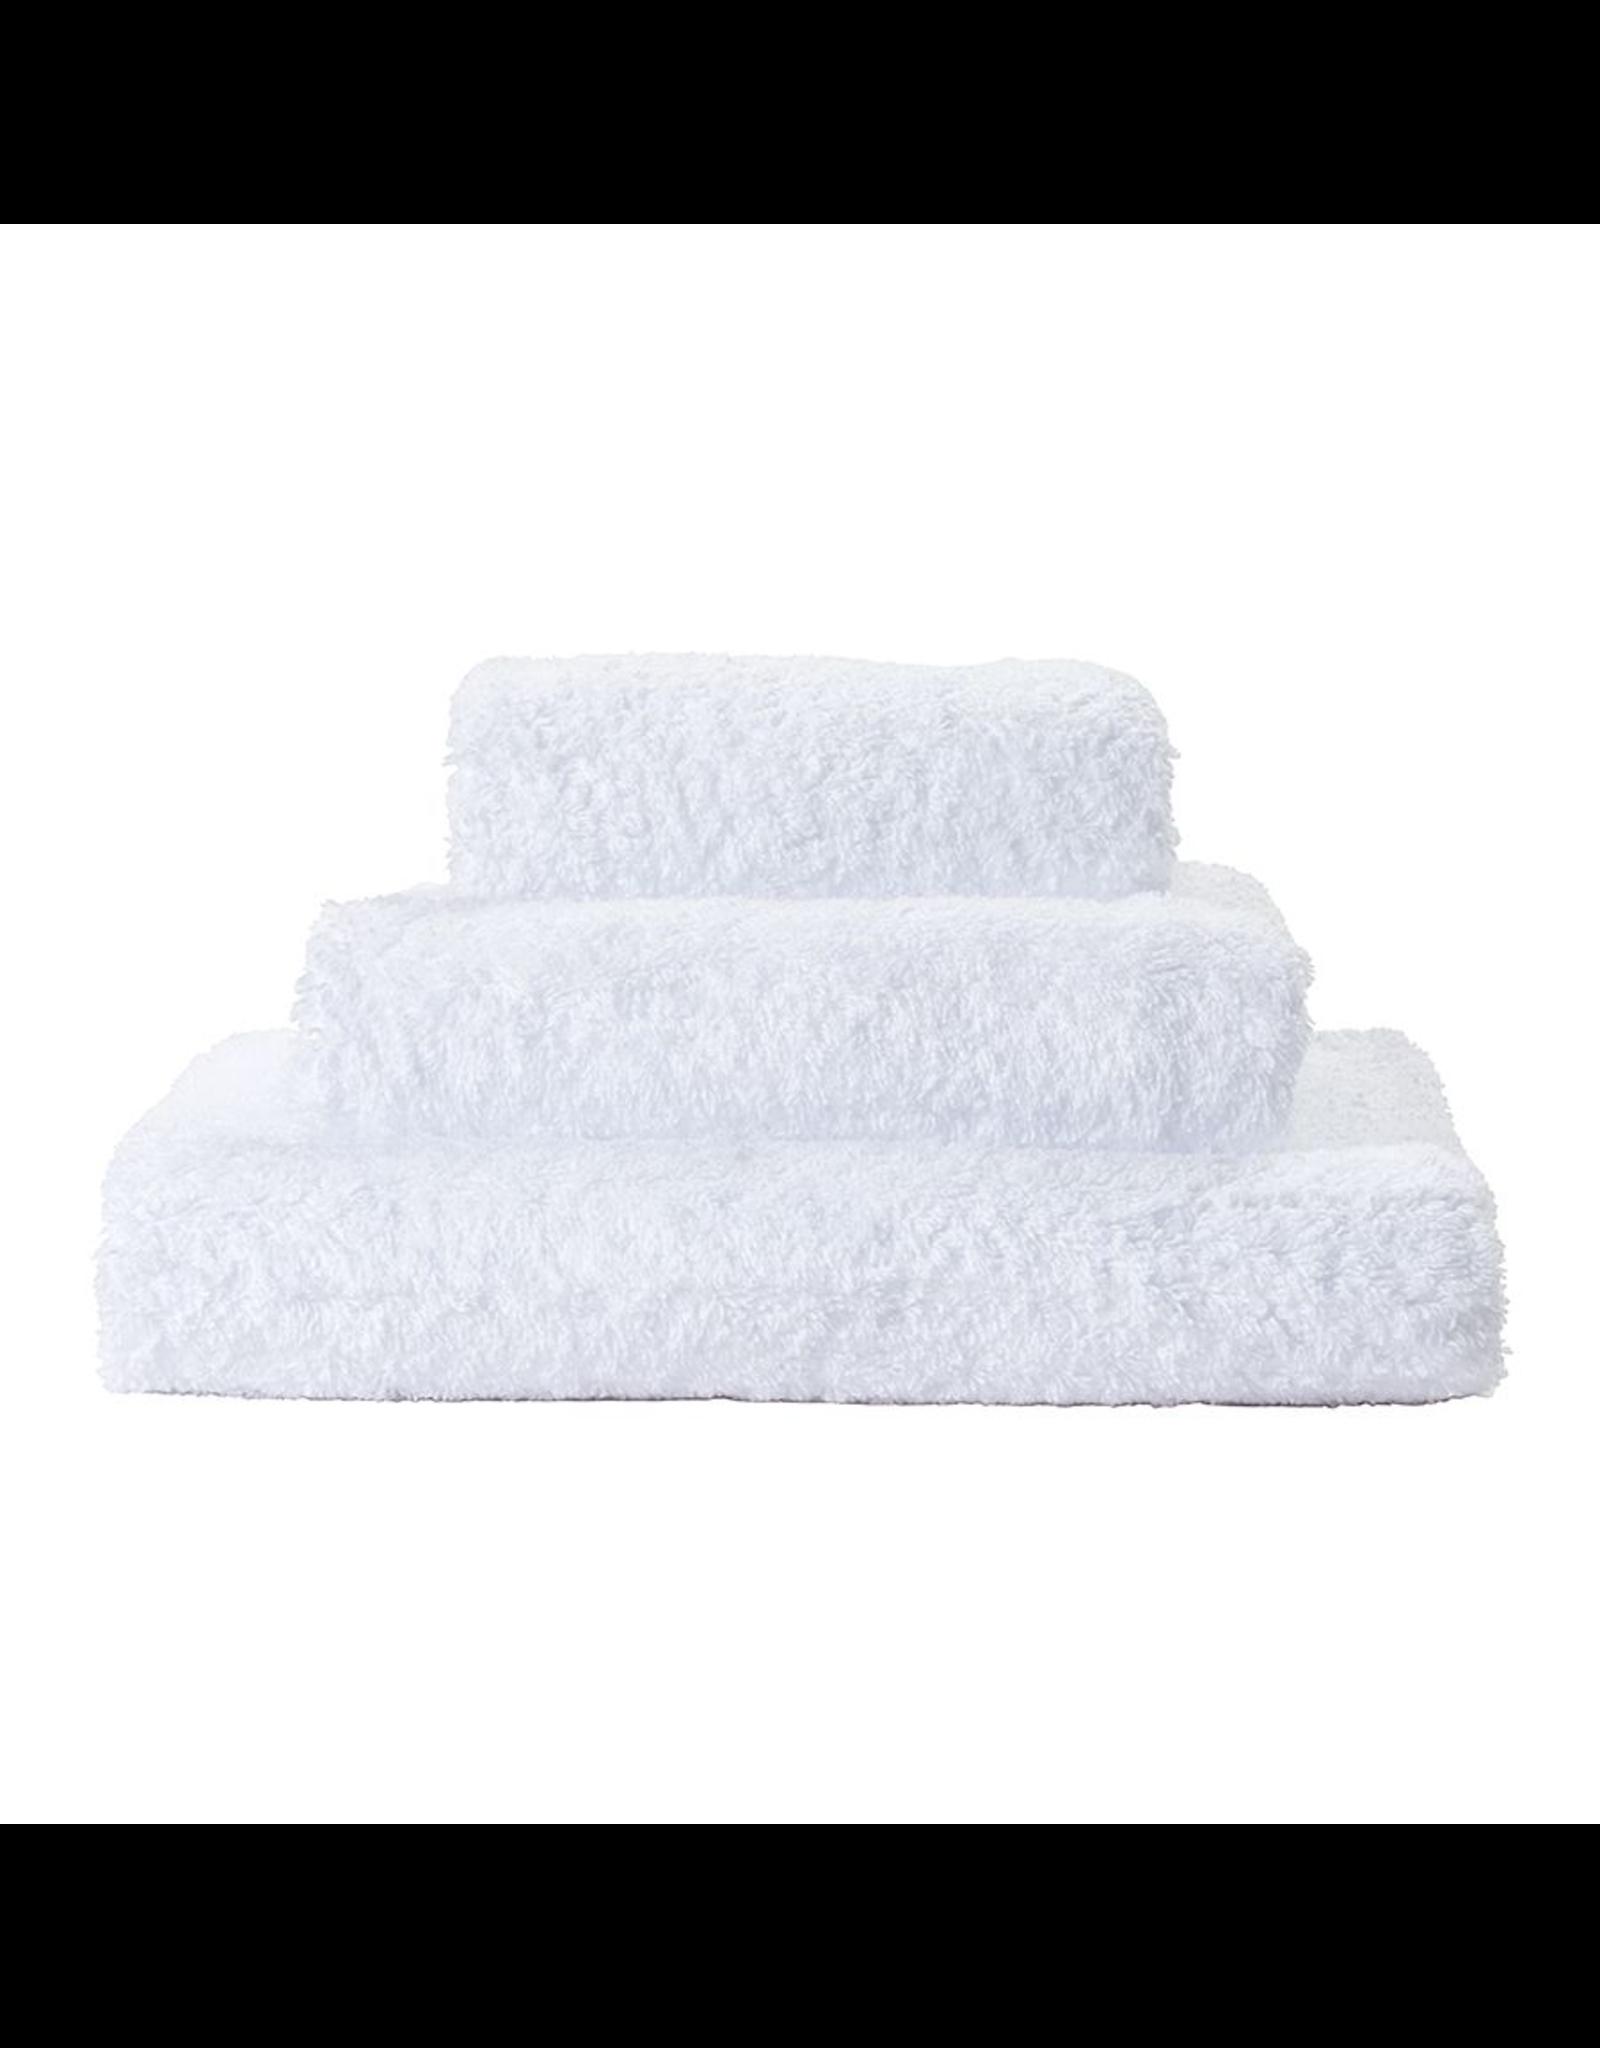 St. Geneve Super Pile Hand Towel 100% Egyptian Cotton, White